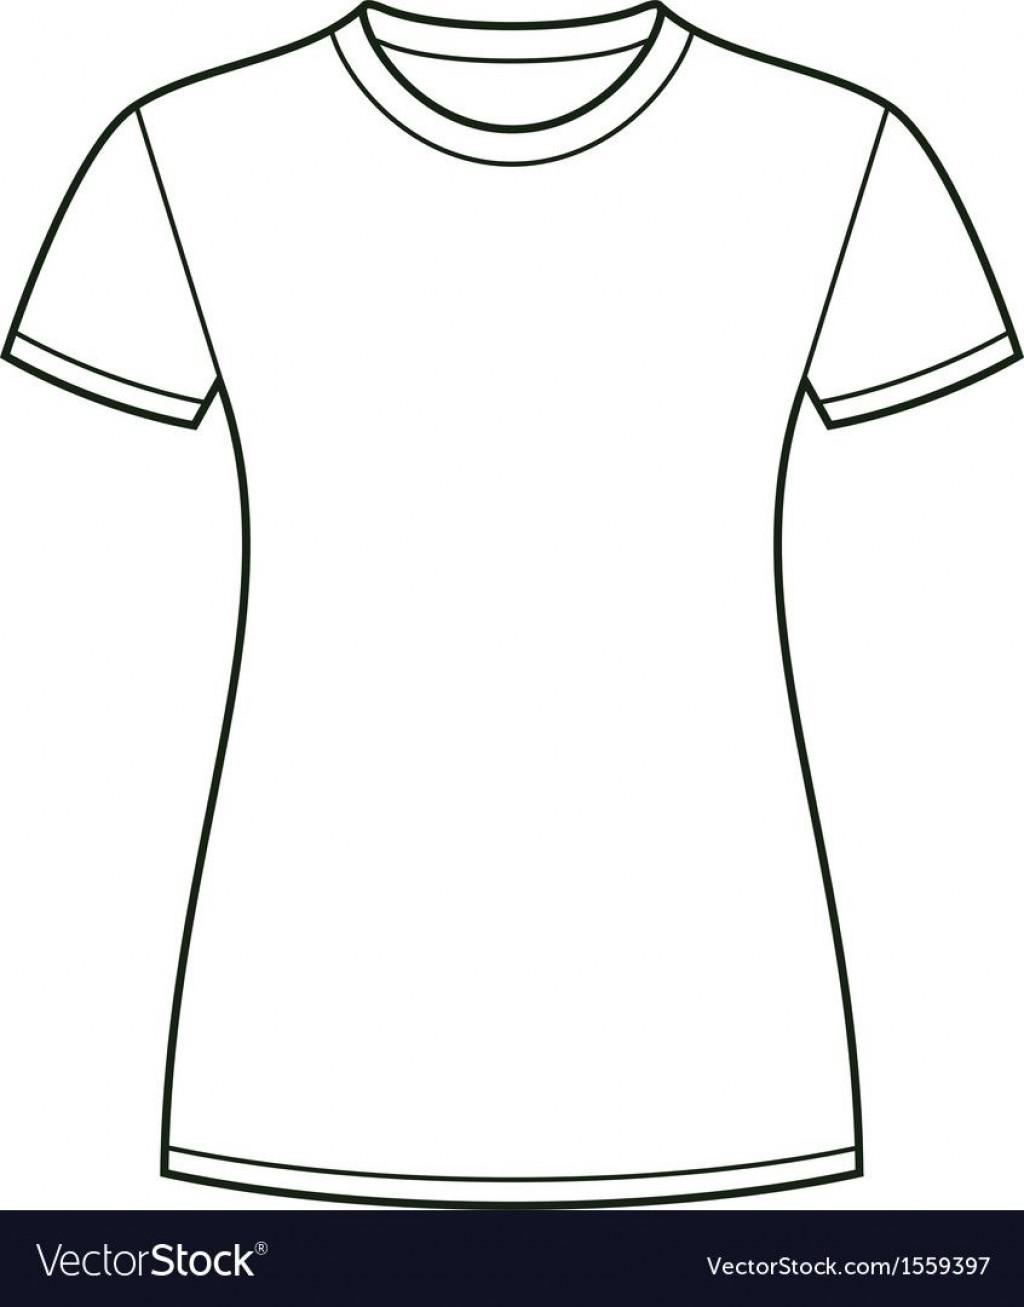 008 Impressive T Shirt Design Template Free Highest Quality  Psd DownloadLarge